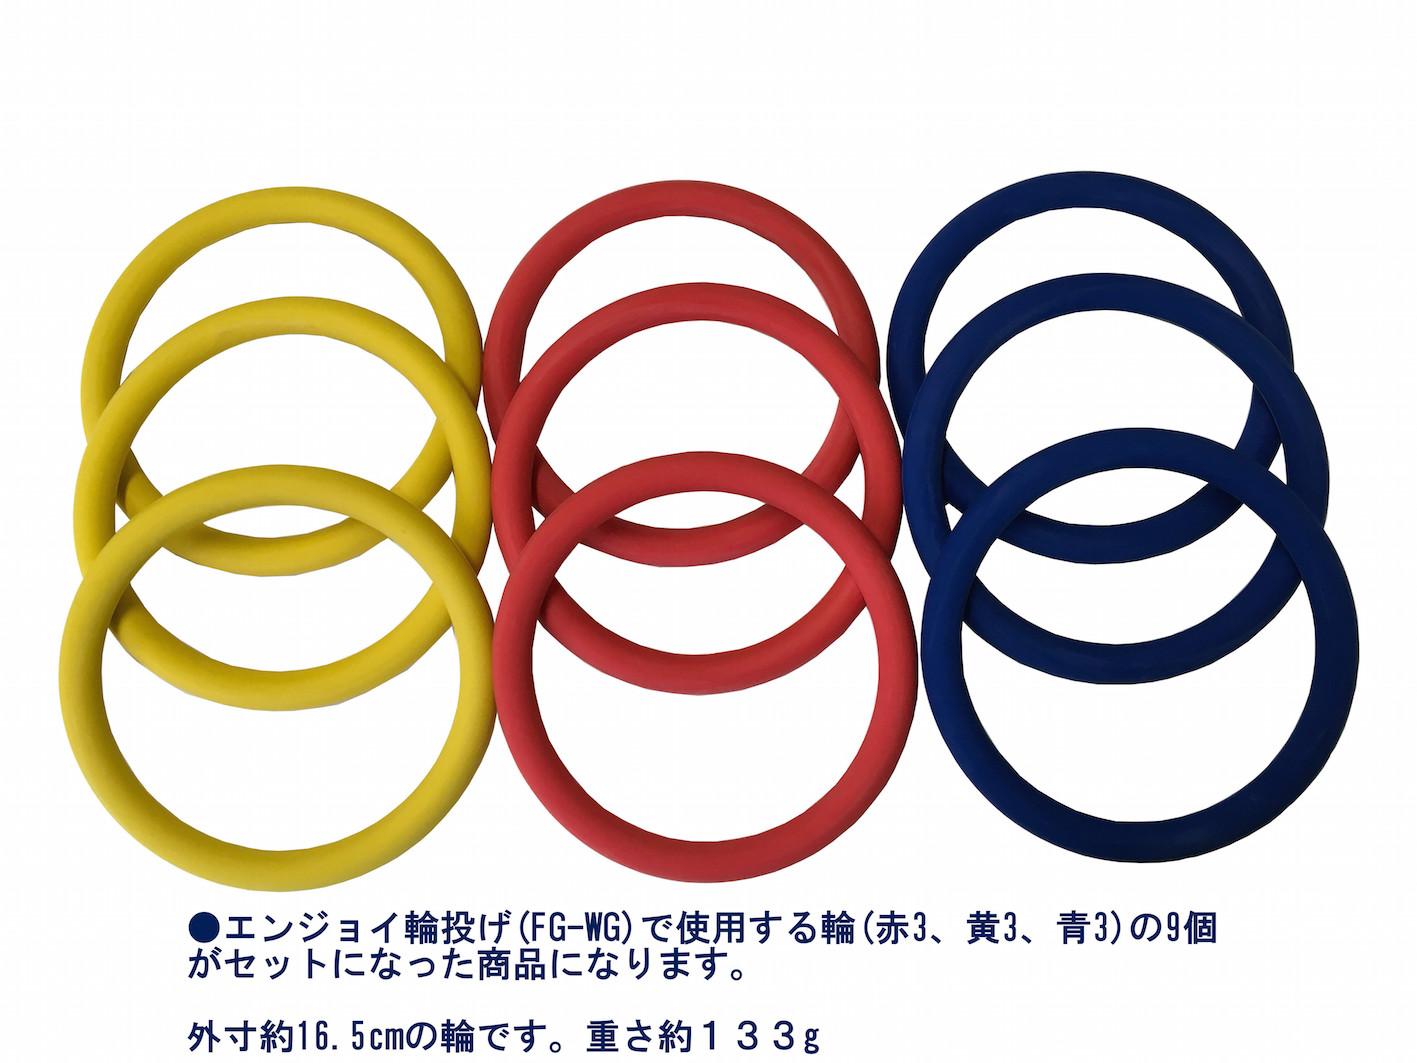 FIELD GEAR エンジョイ 輪投げ セット DXタイプ FG-WG 送料無料